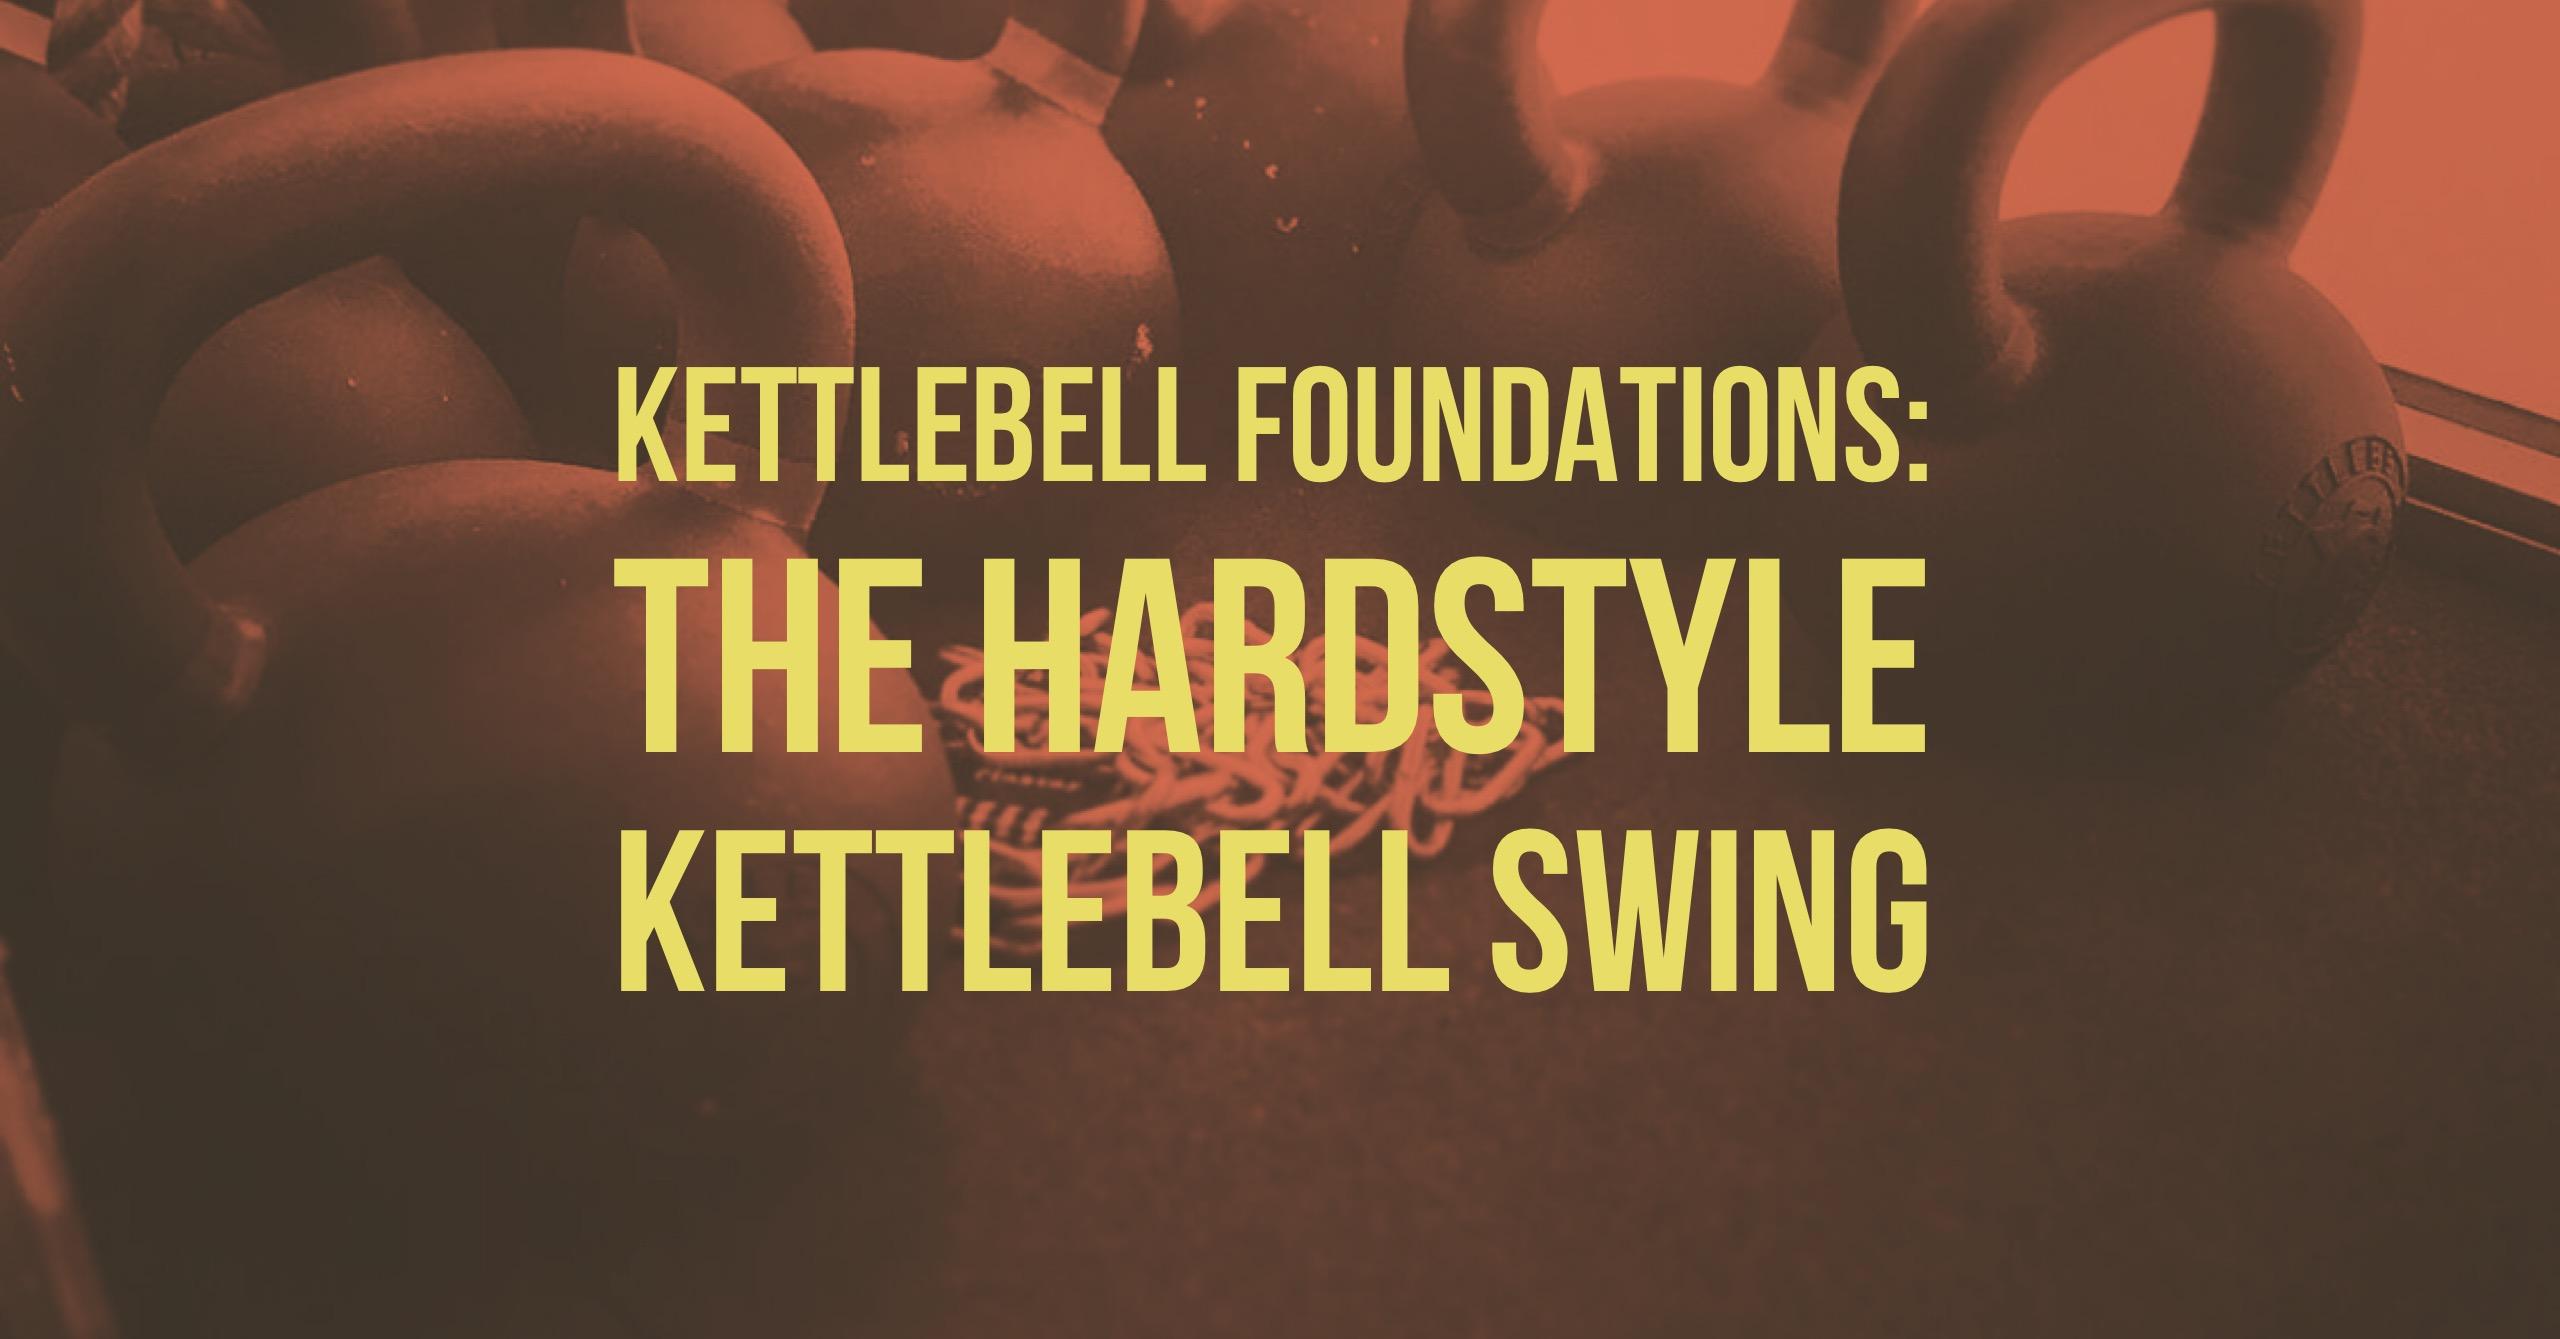 Kettlebell Foundations: The Hardstyle Kettlebell Swing